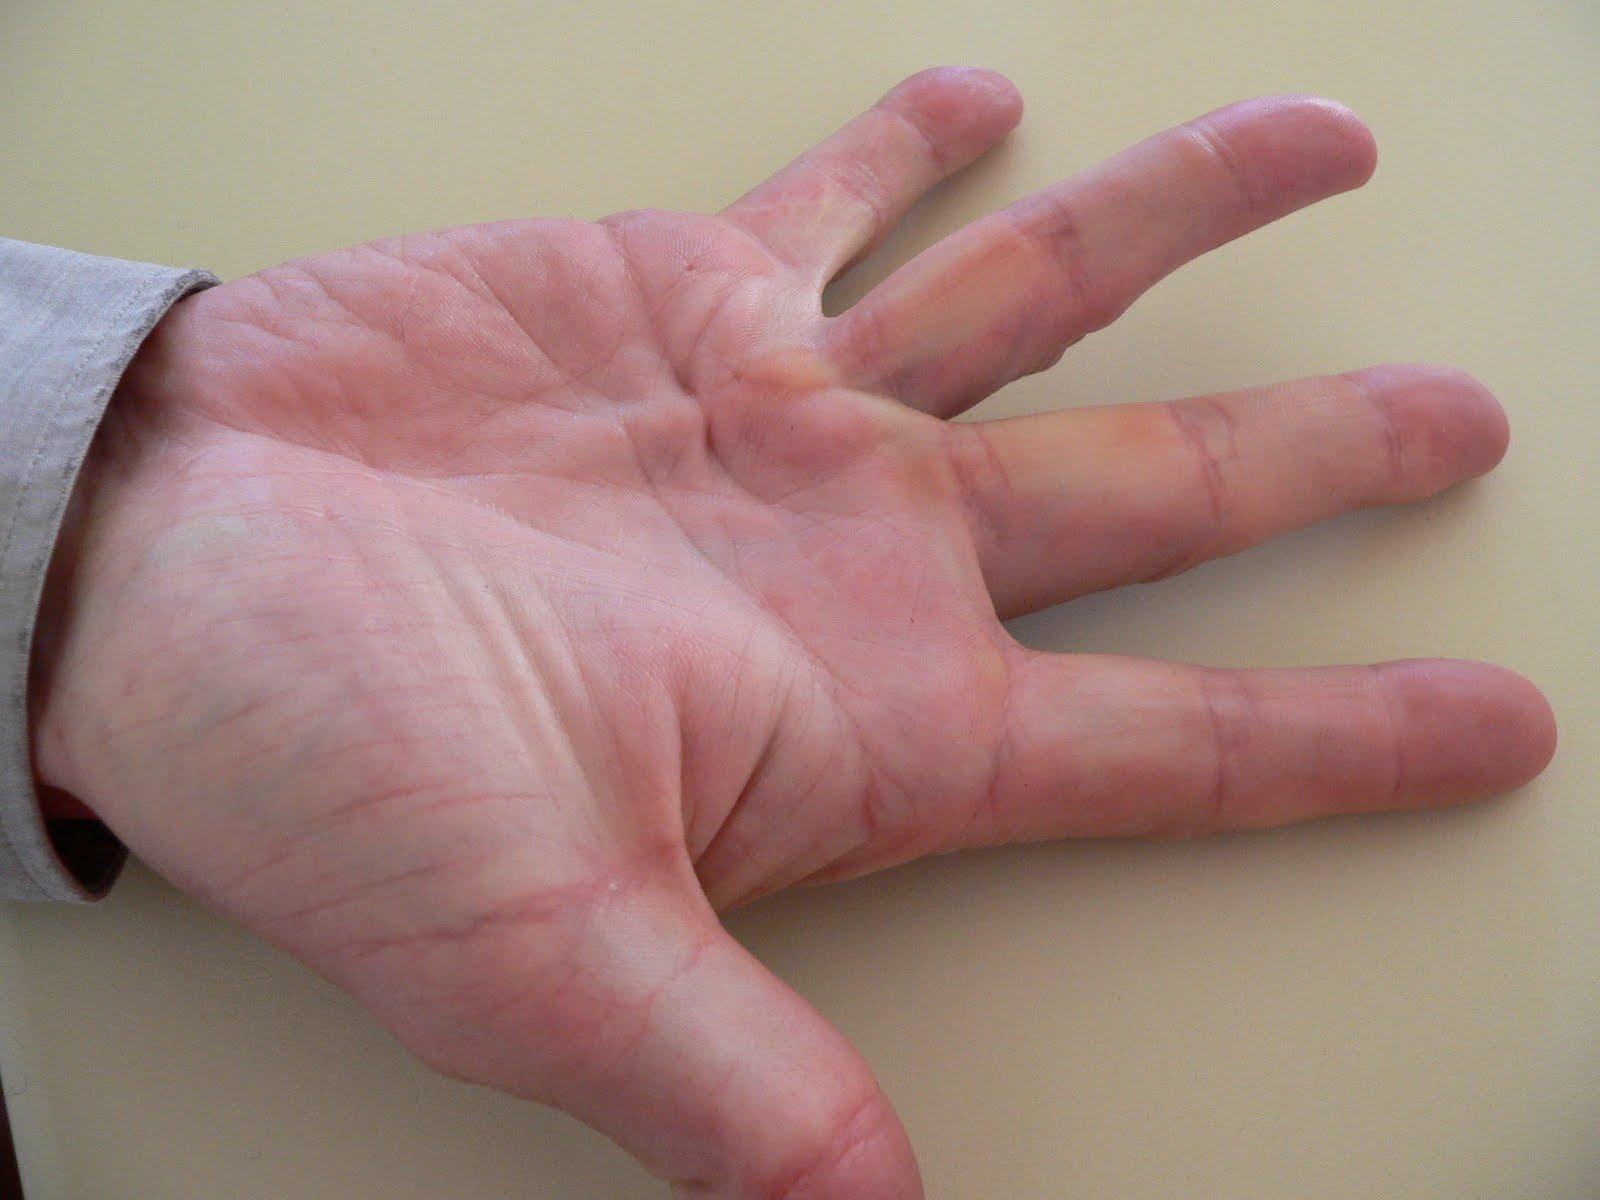 What Causes Peyronie's Disease?